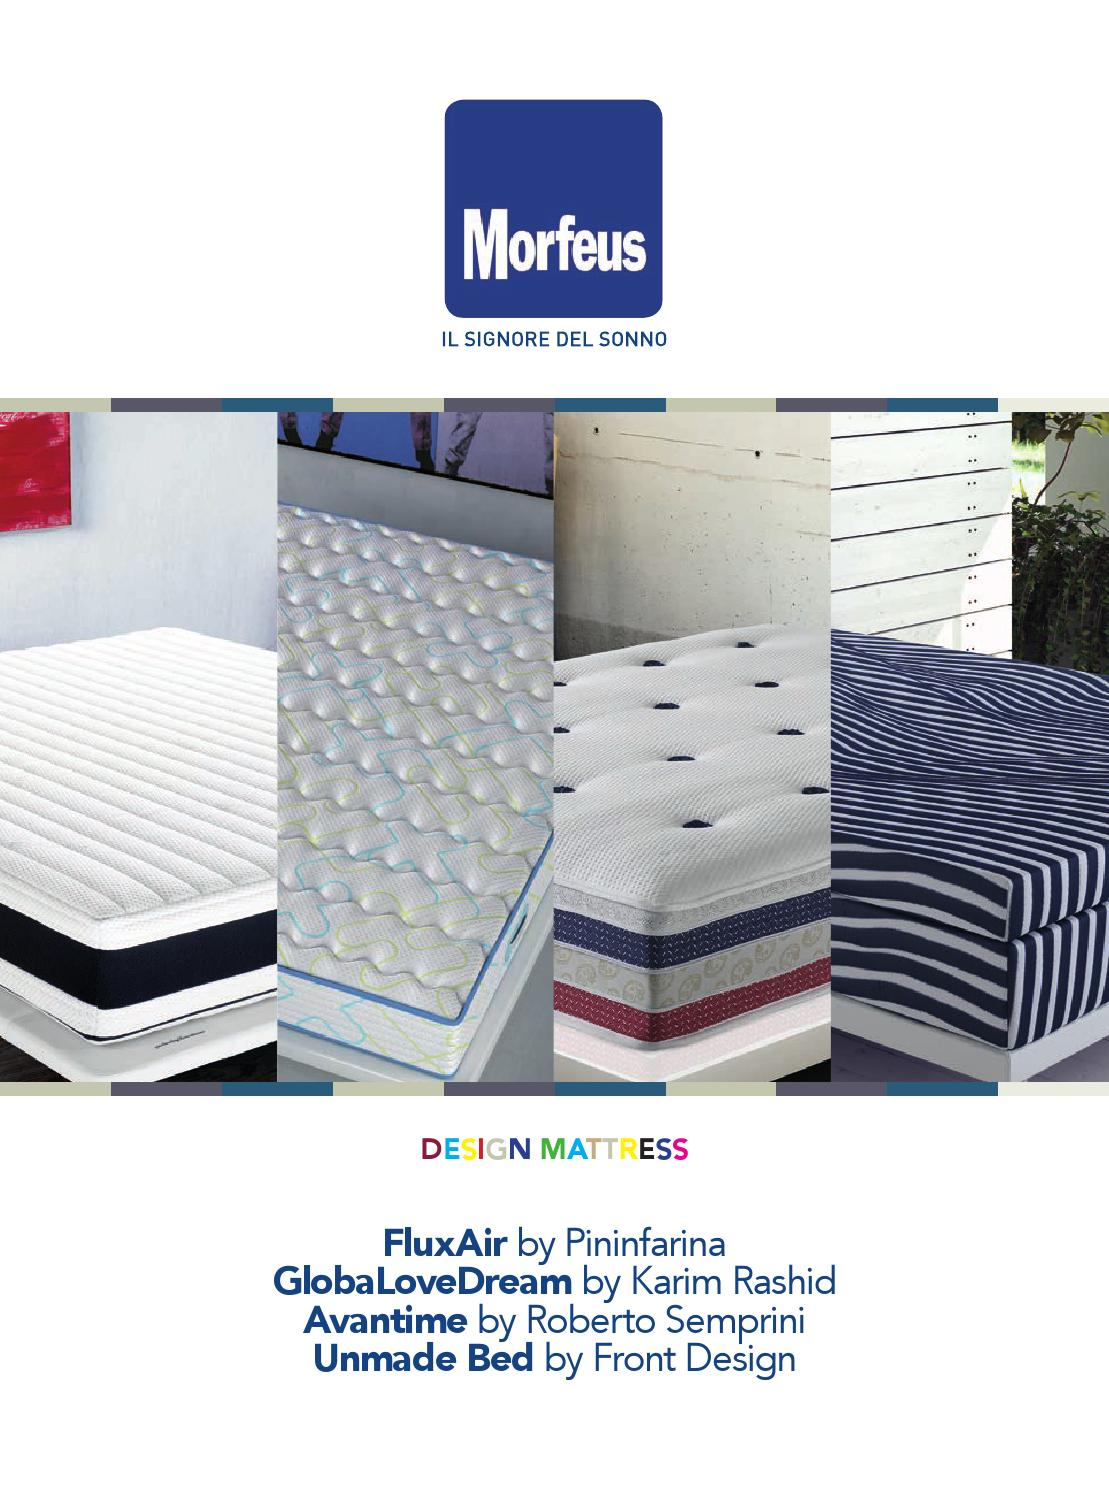 Morfeus catalogo 2014 by Mobilpro - issuu